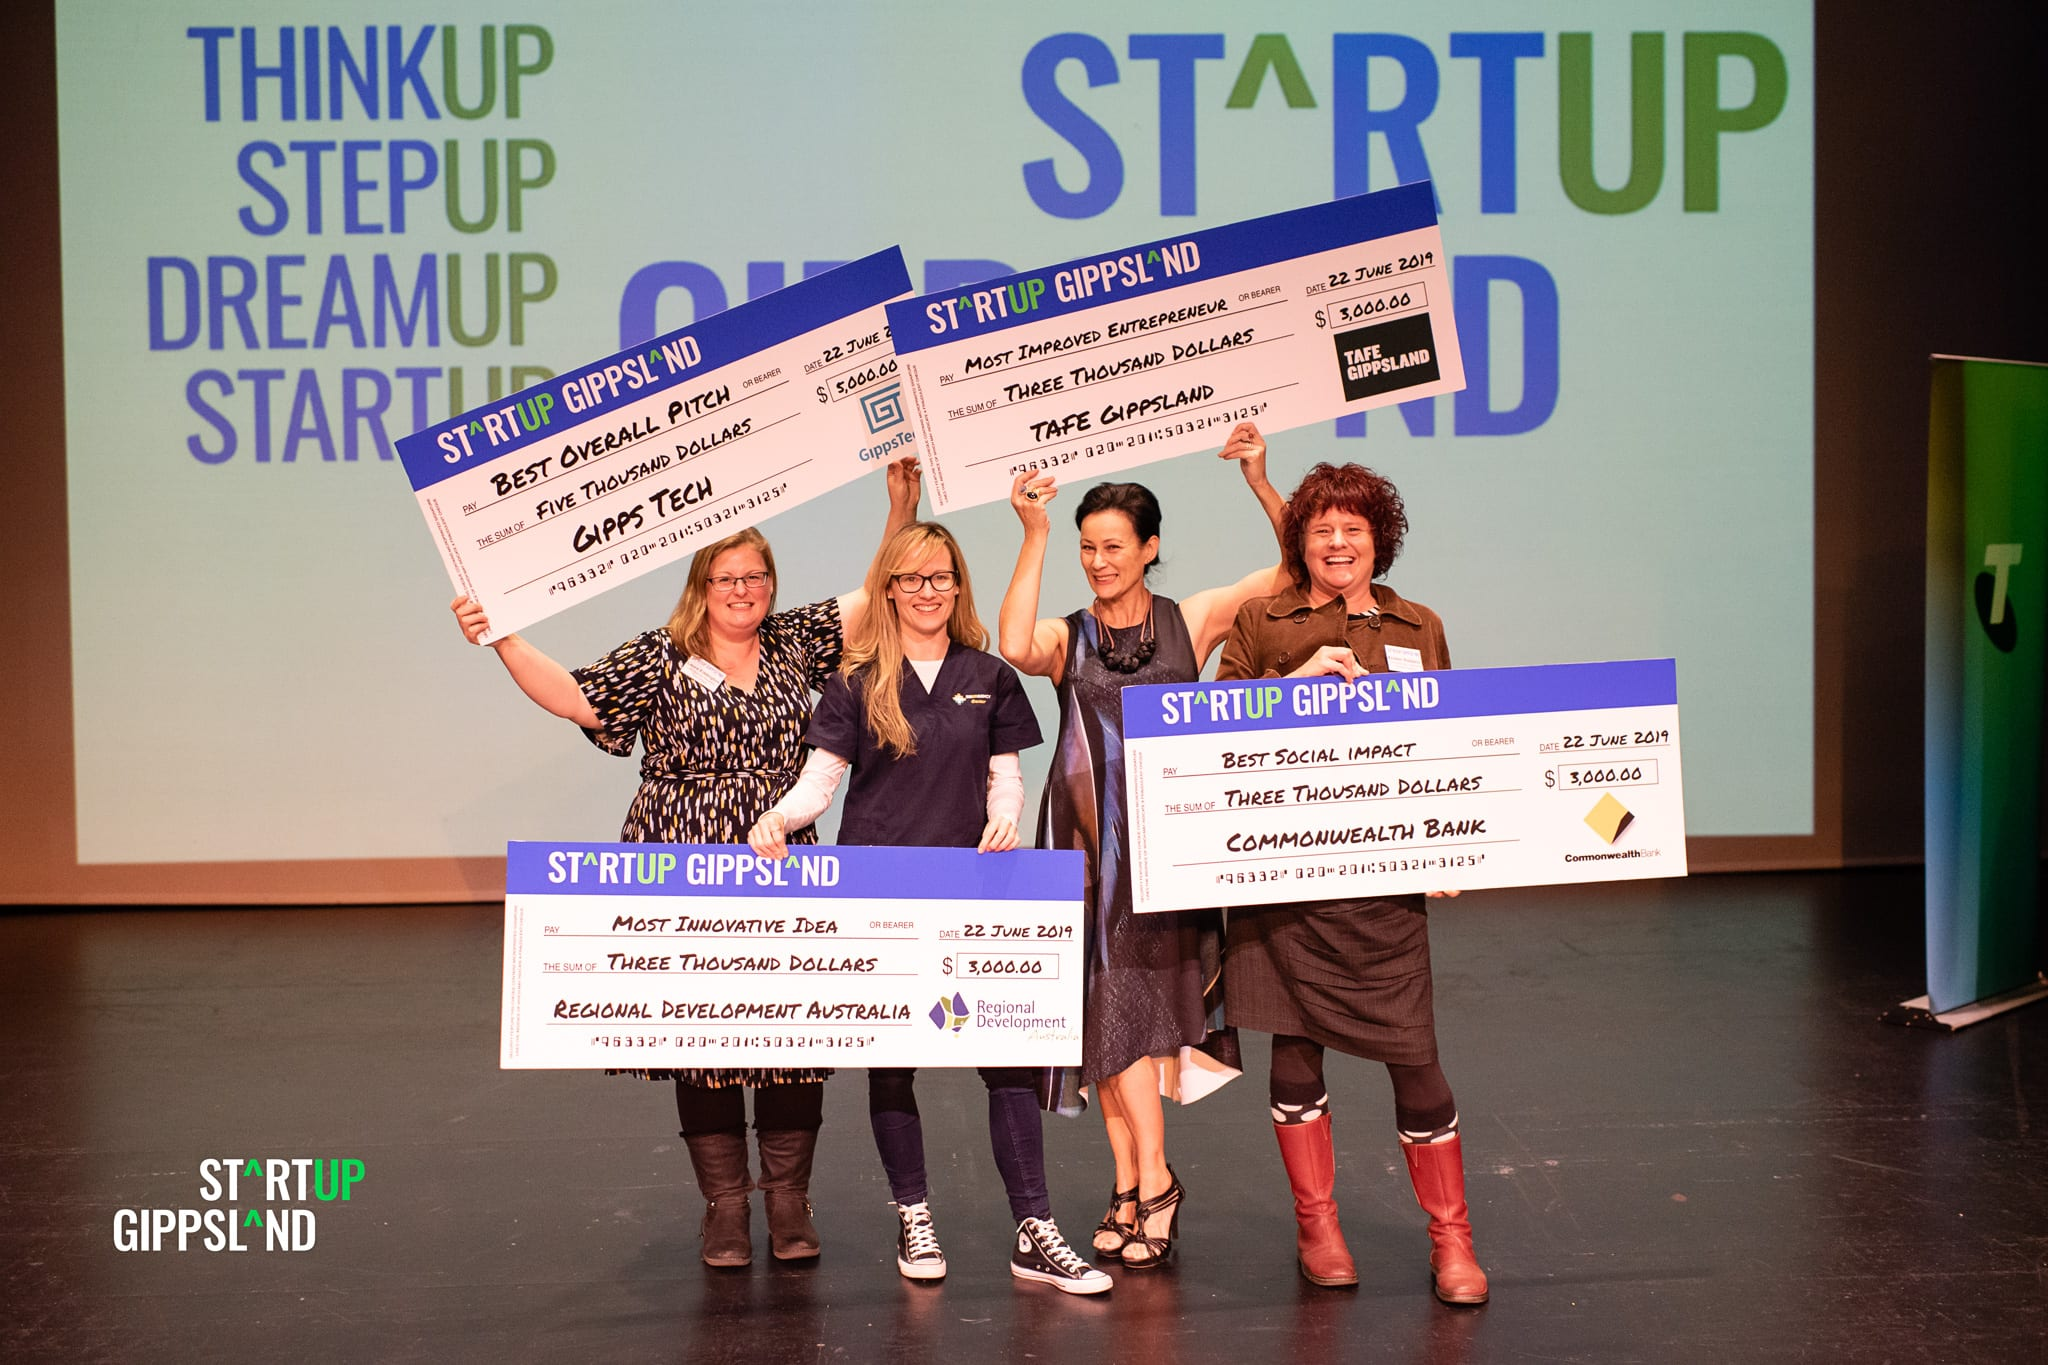 Startup Gippsland Photo Gallery Showcase winners